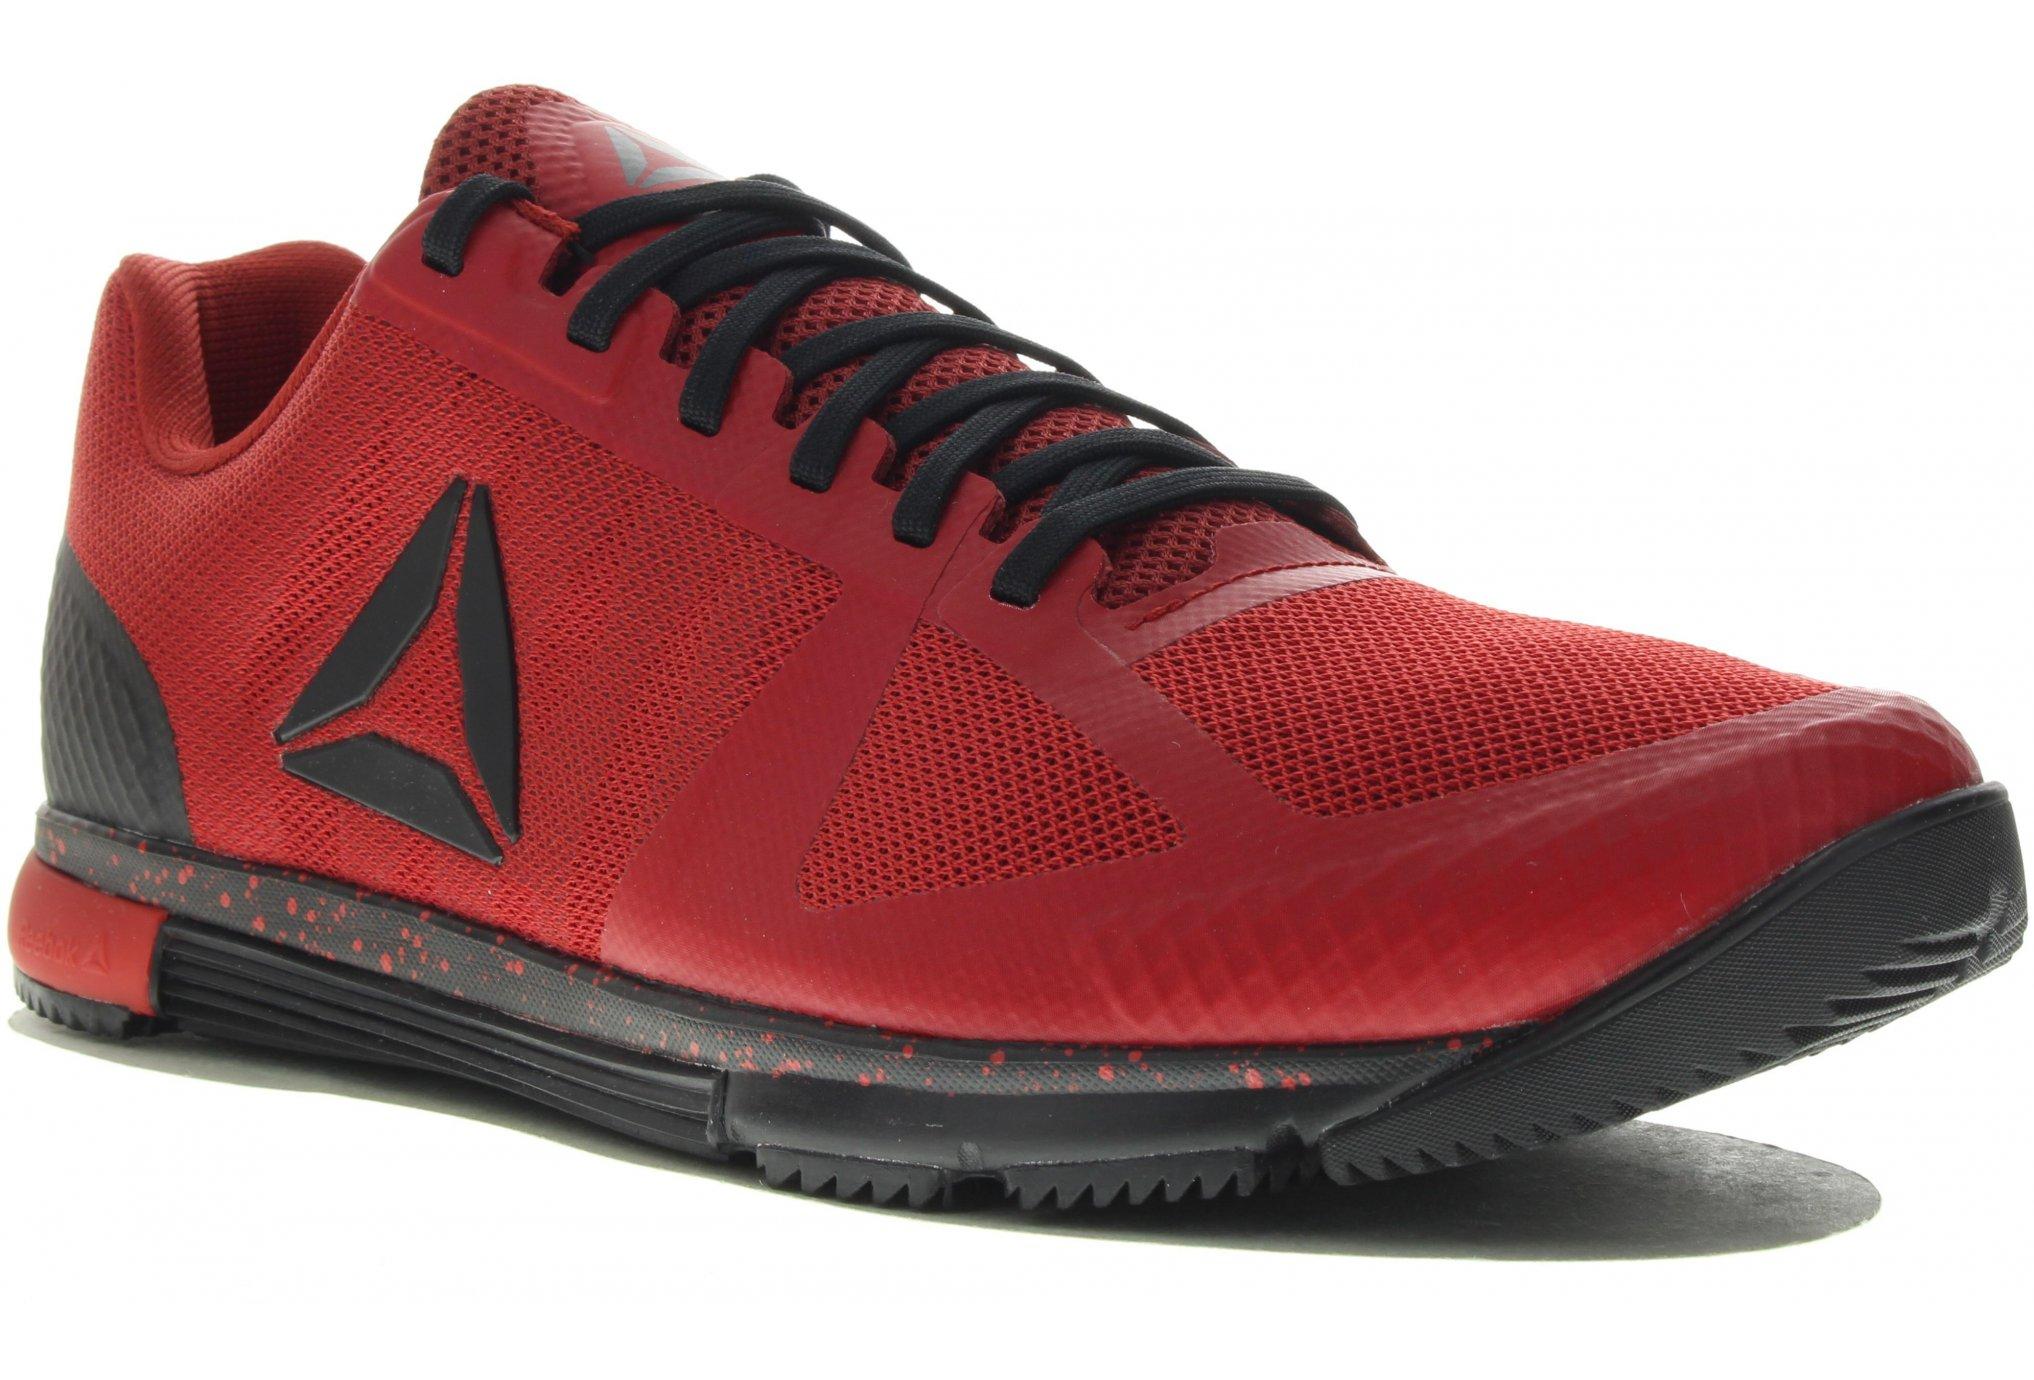 2 M Tr 0 Homme Reebok Aventure Raid Chaussures Speed Crossfit Sénon bYeH2WE9DI